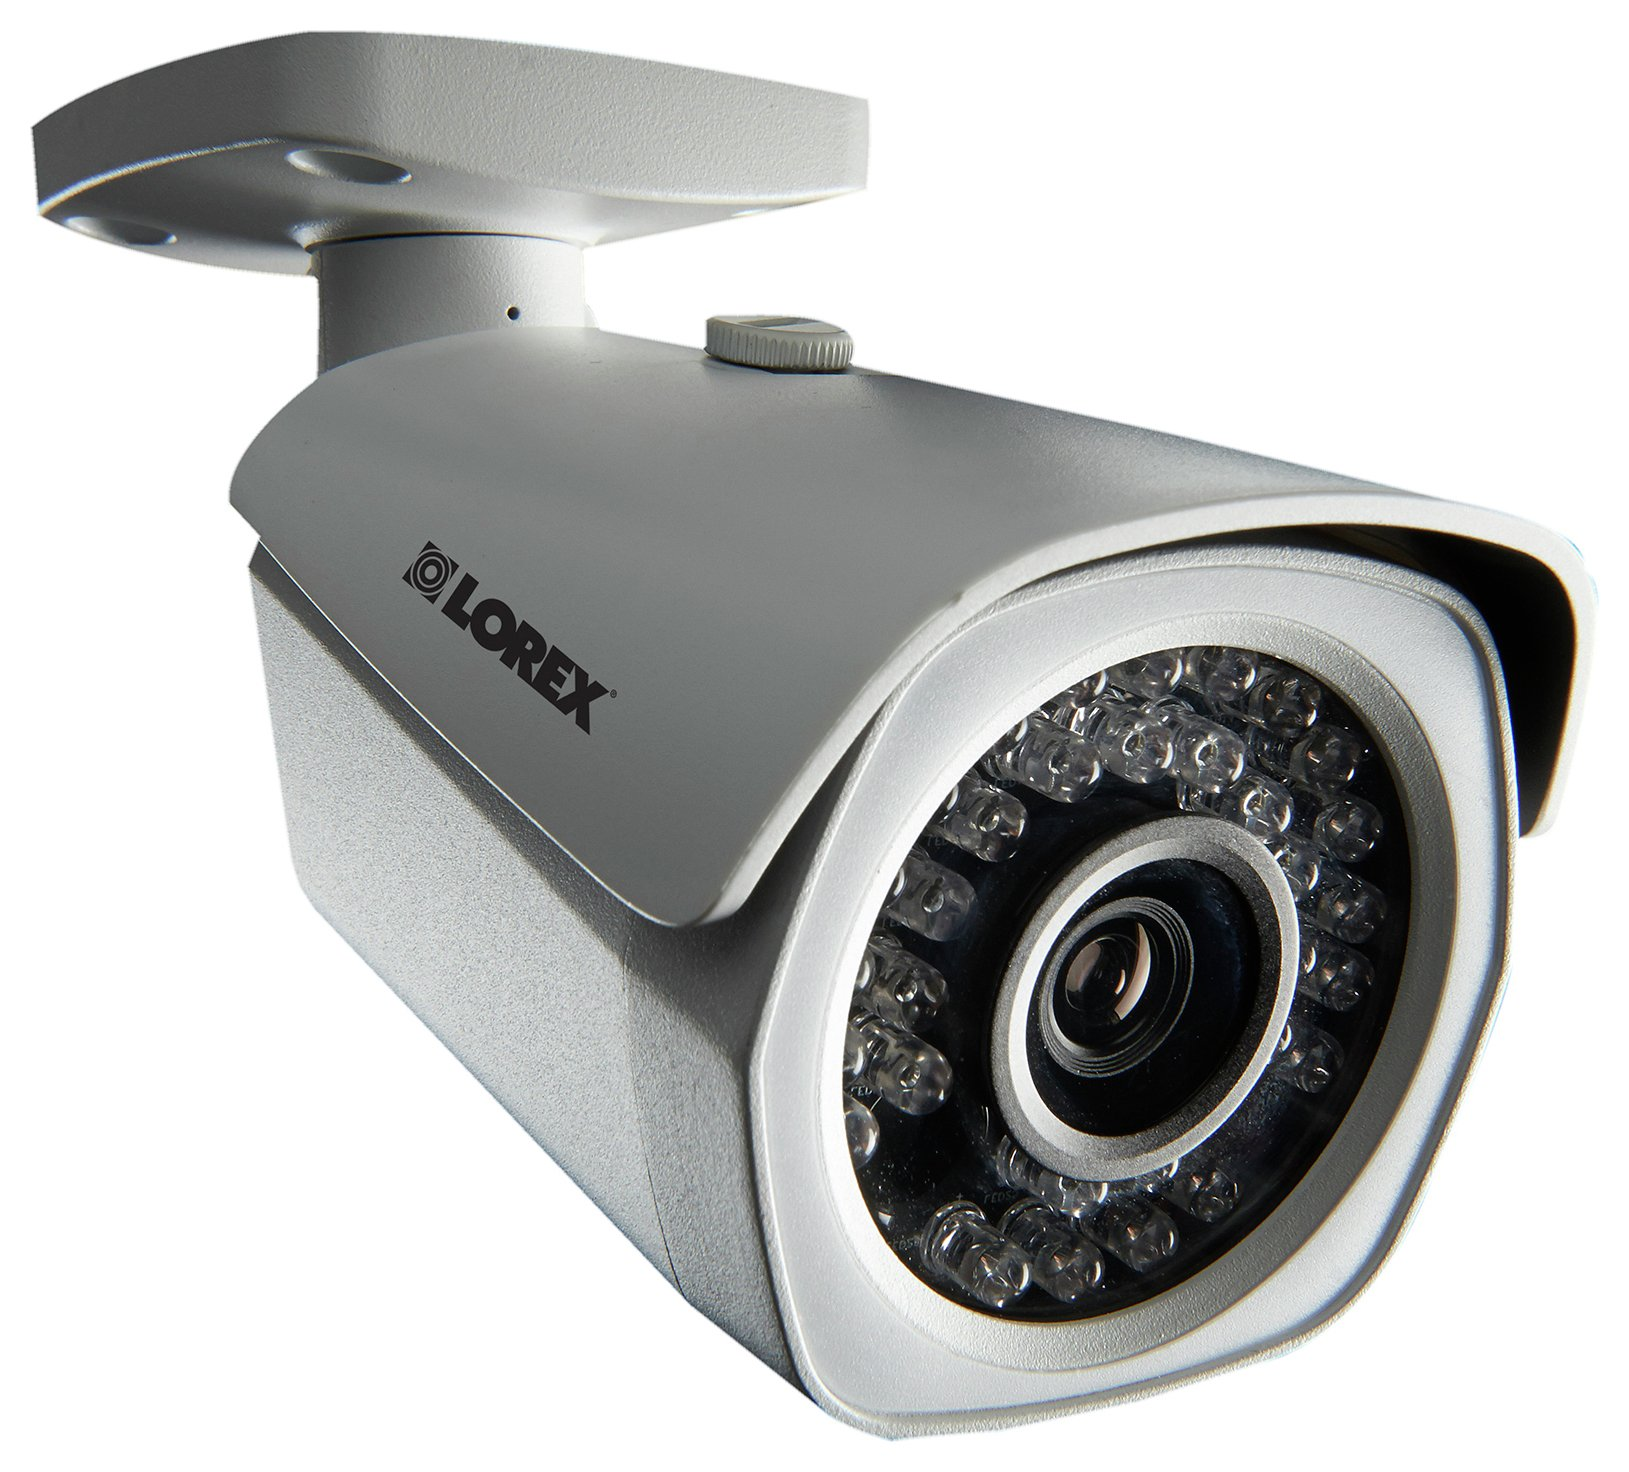 Lorex - LNB3143BP Bullet CCTV Camera